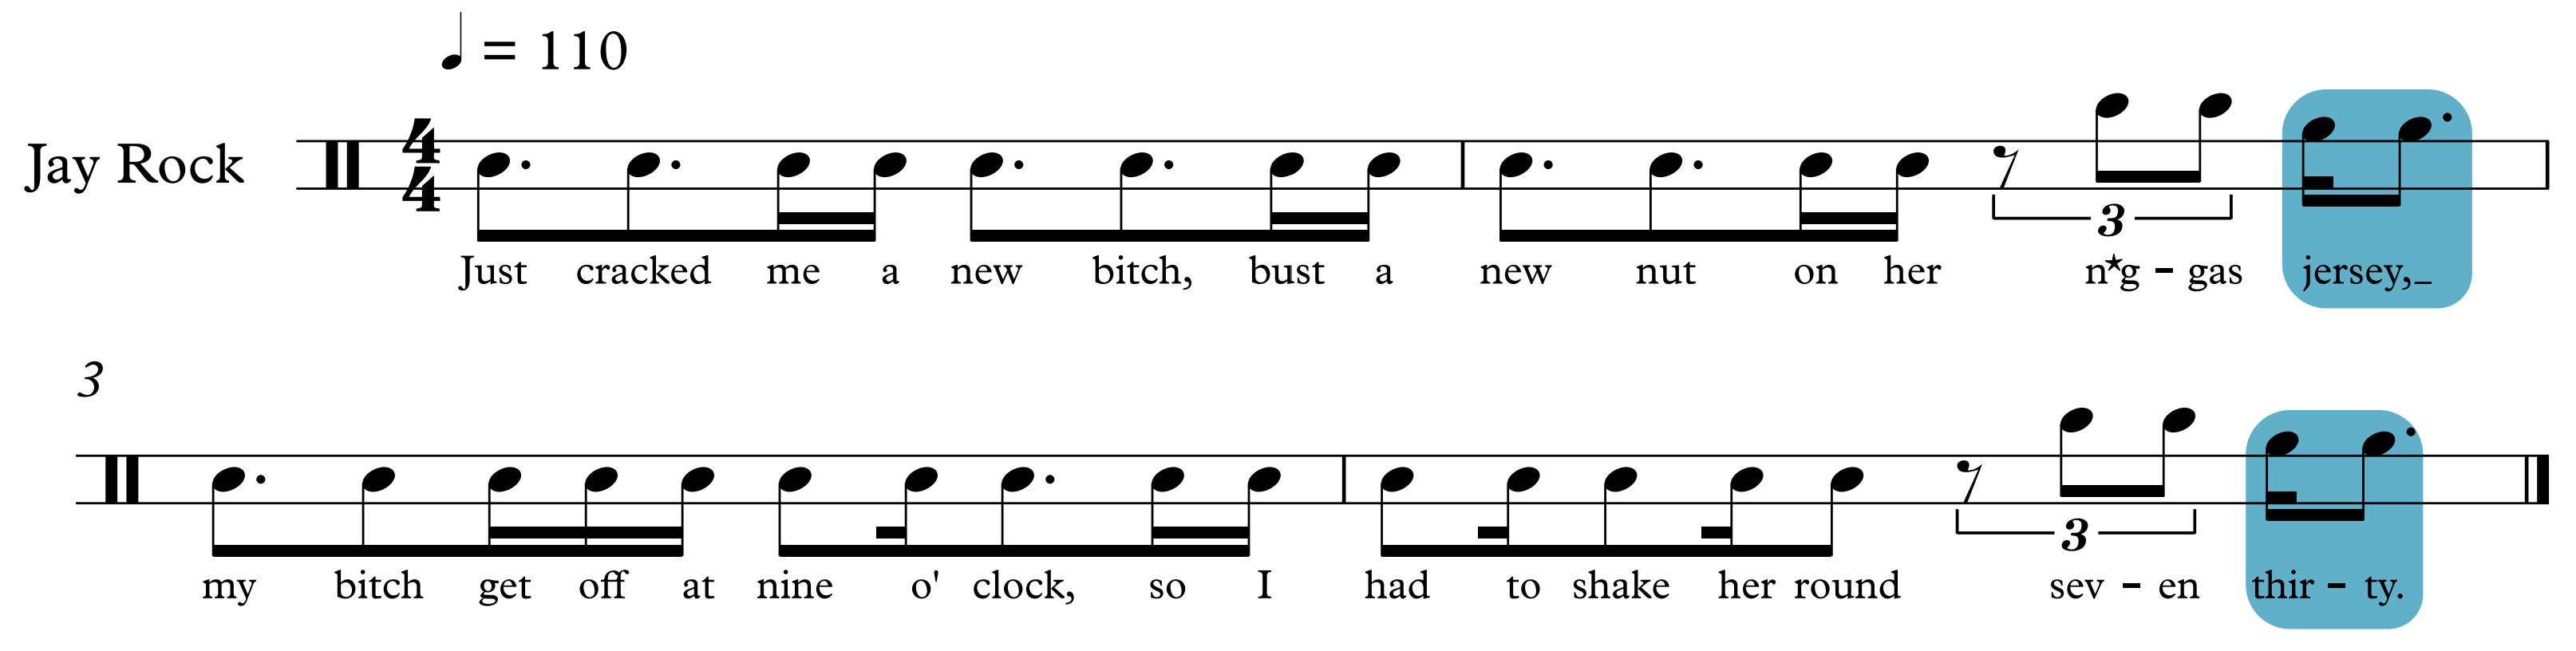 Komaniecki, Example 8